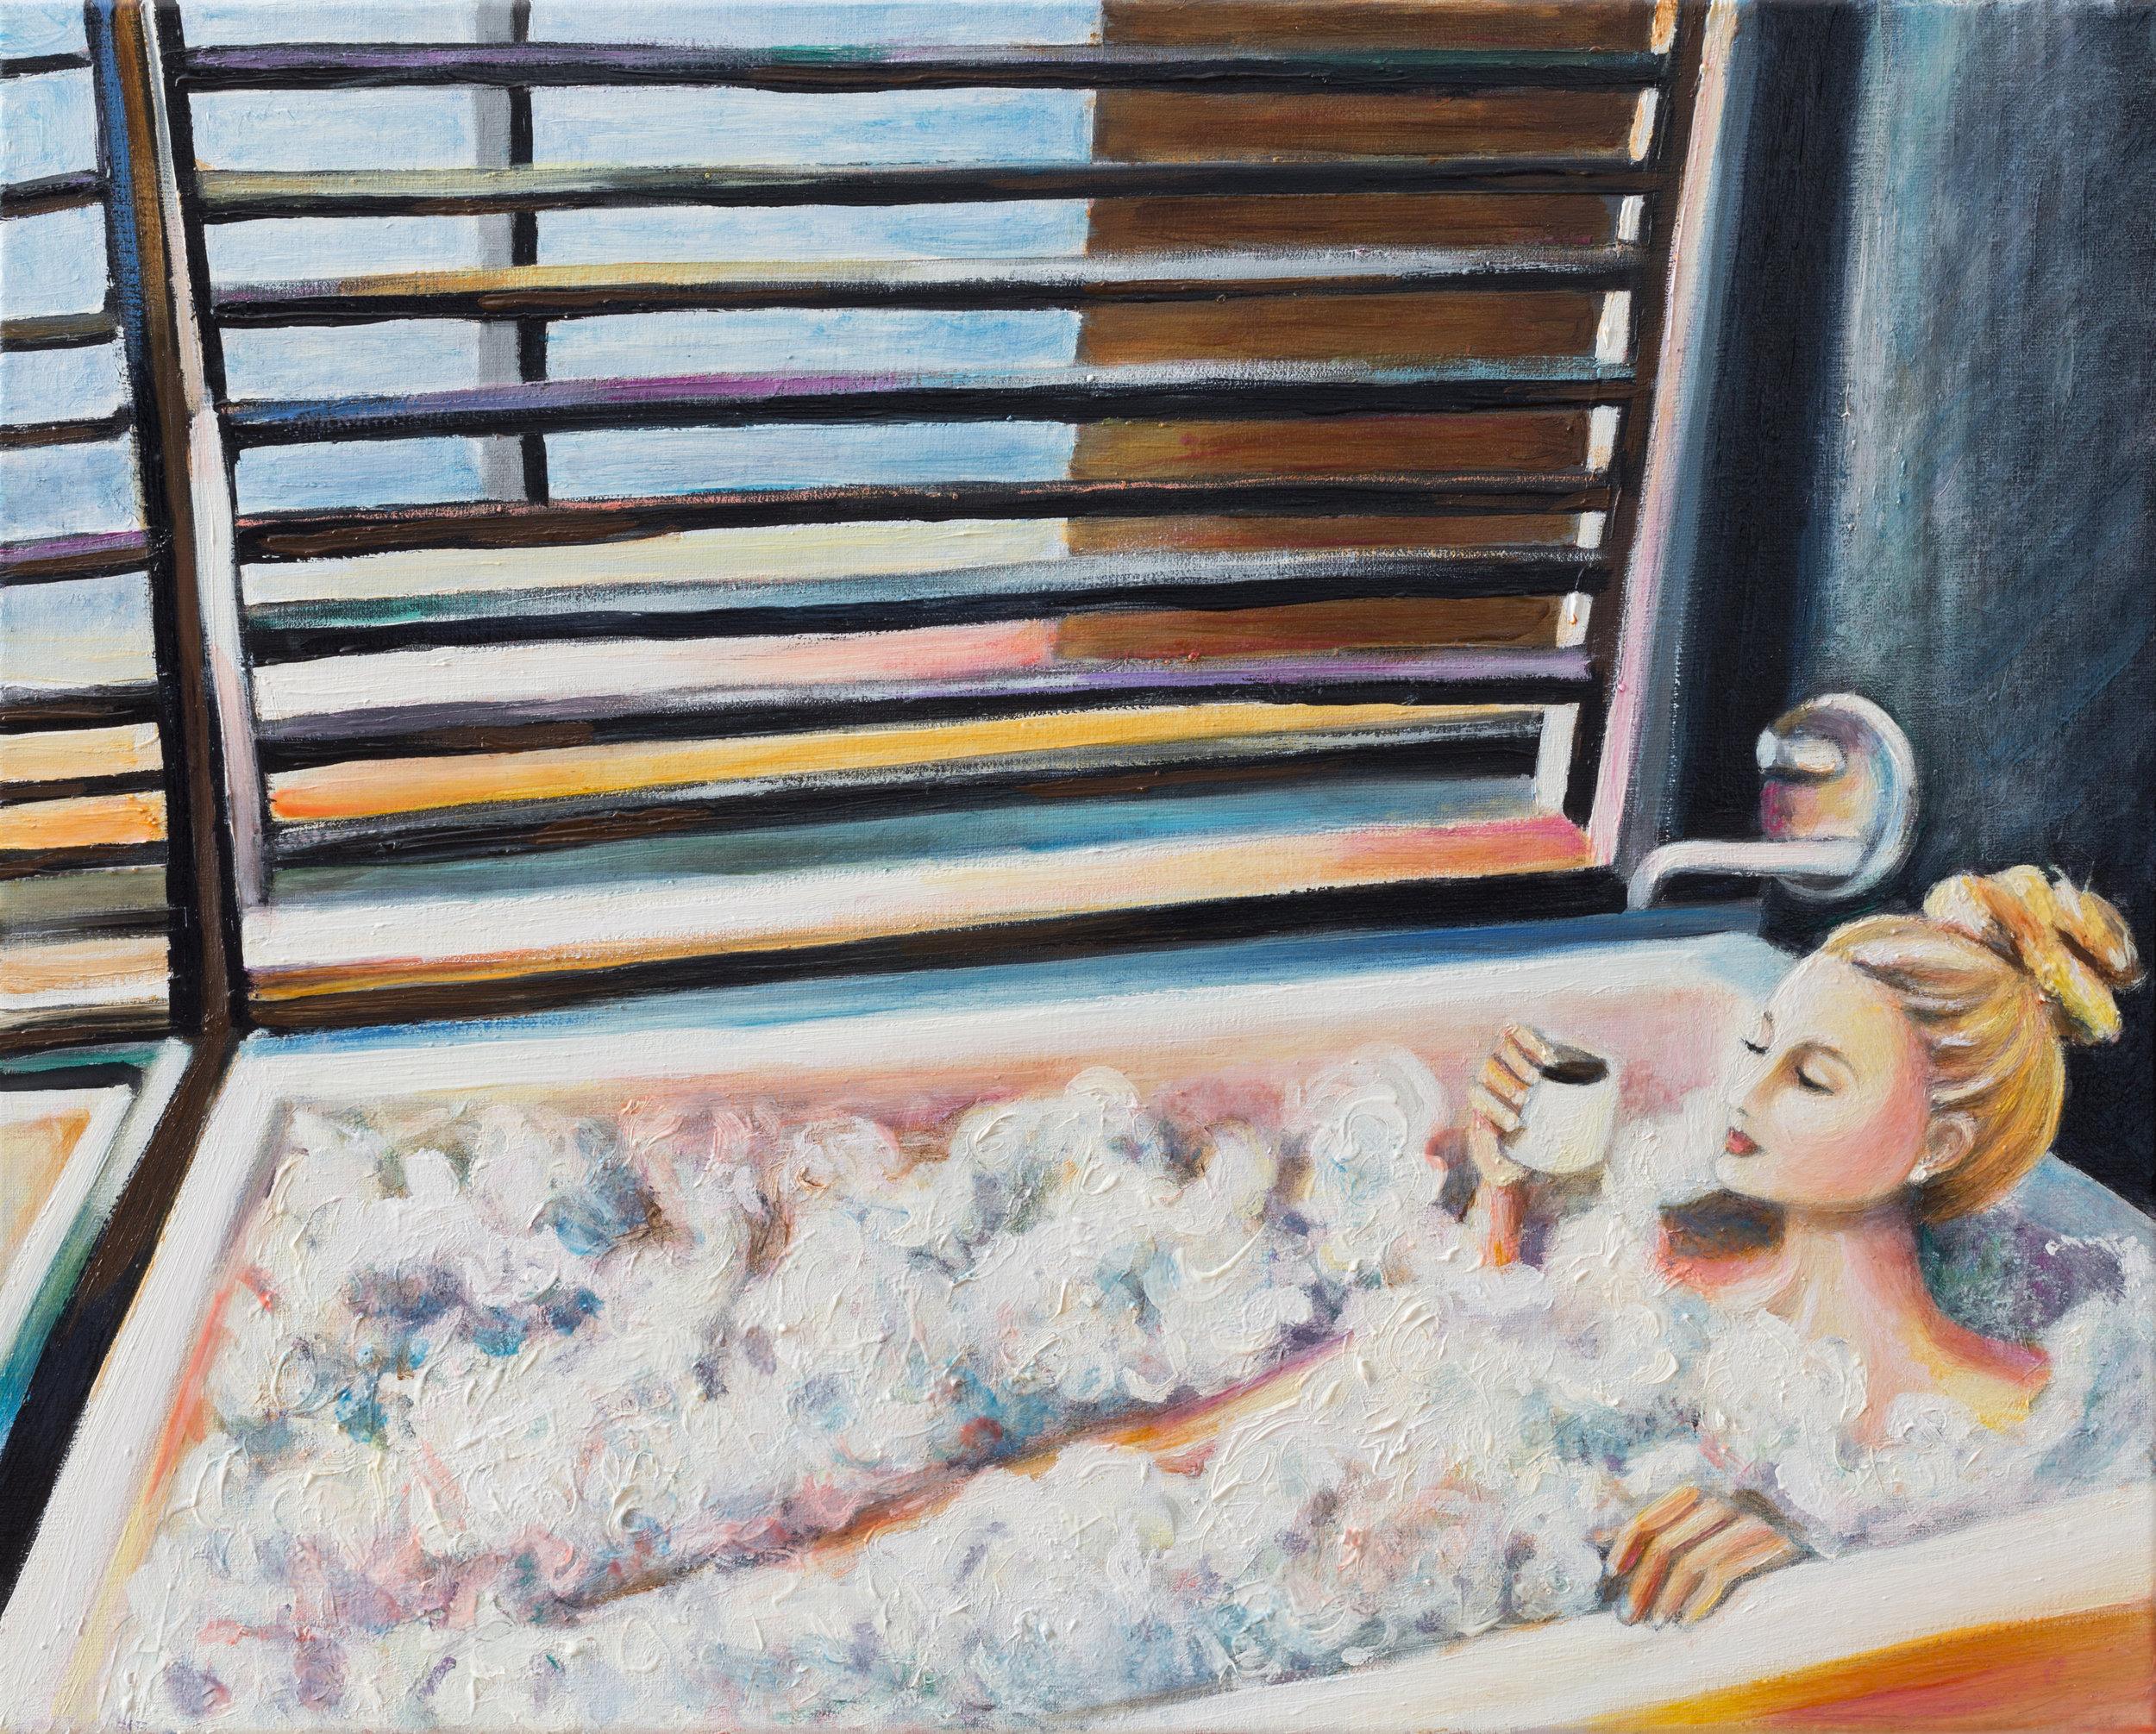 "A Standard Morning    16"" x 20""    Oil on Linen    ©Annika Connor"